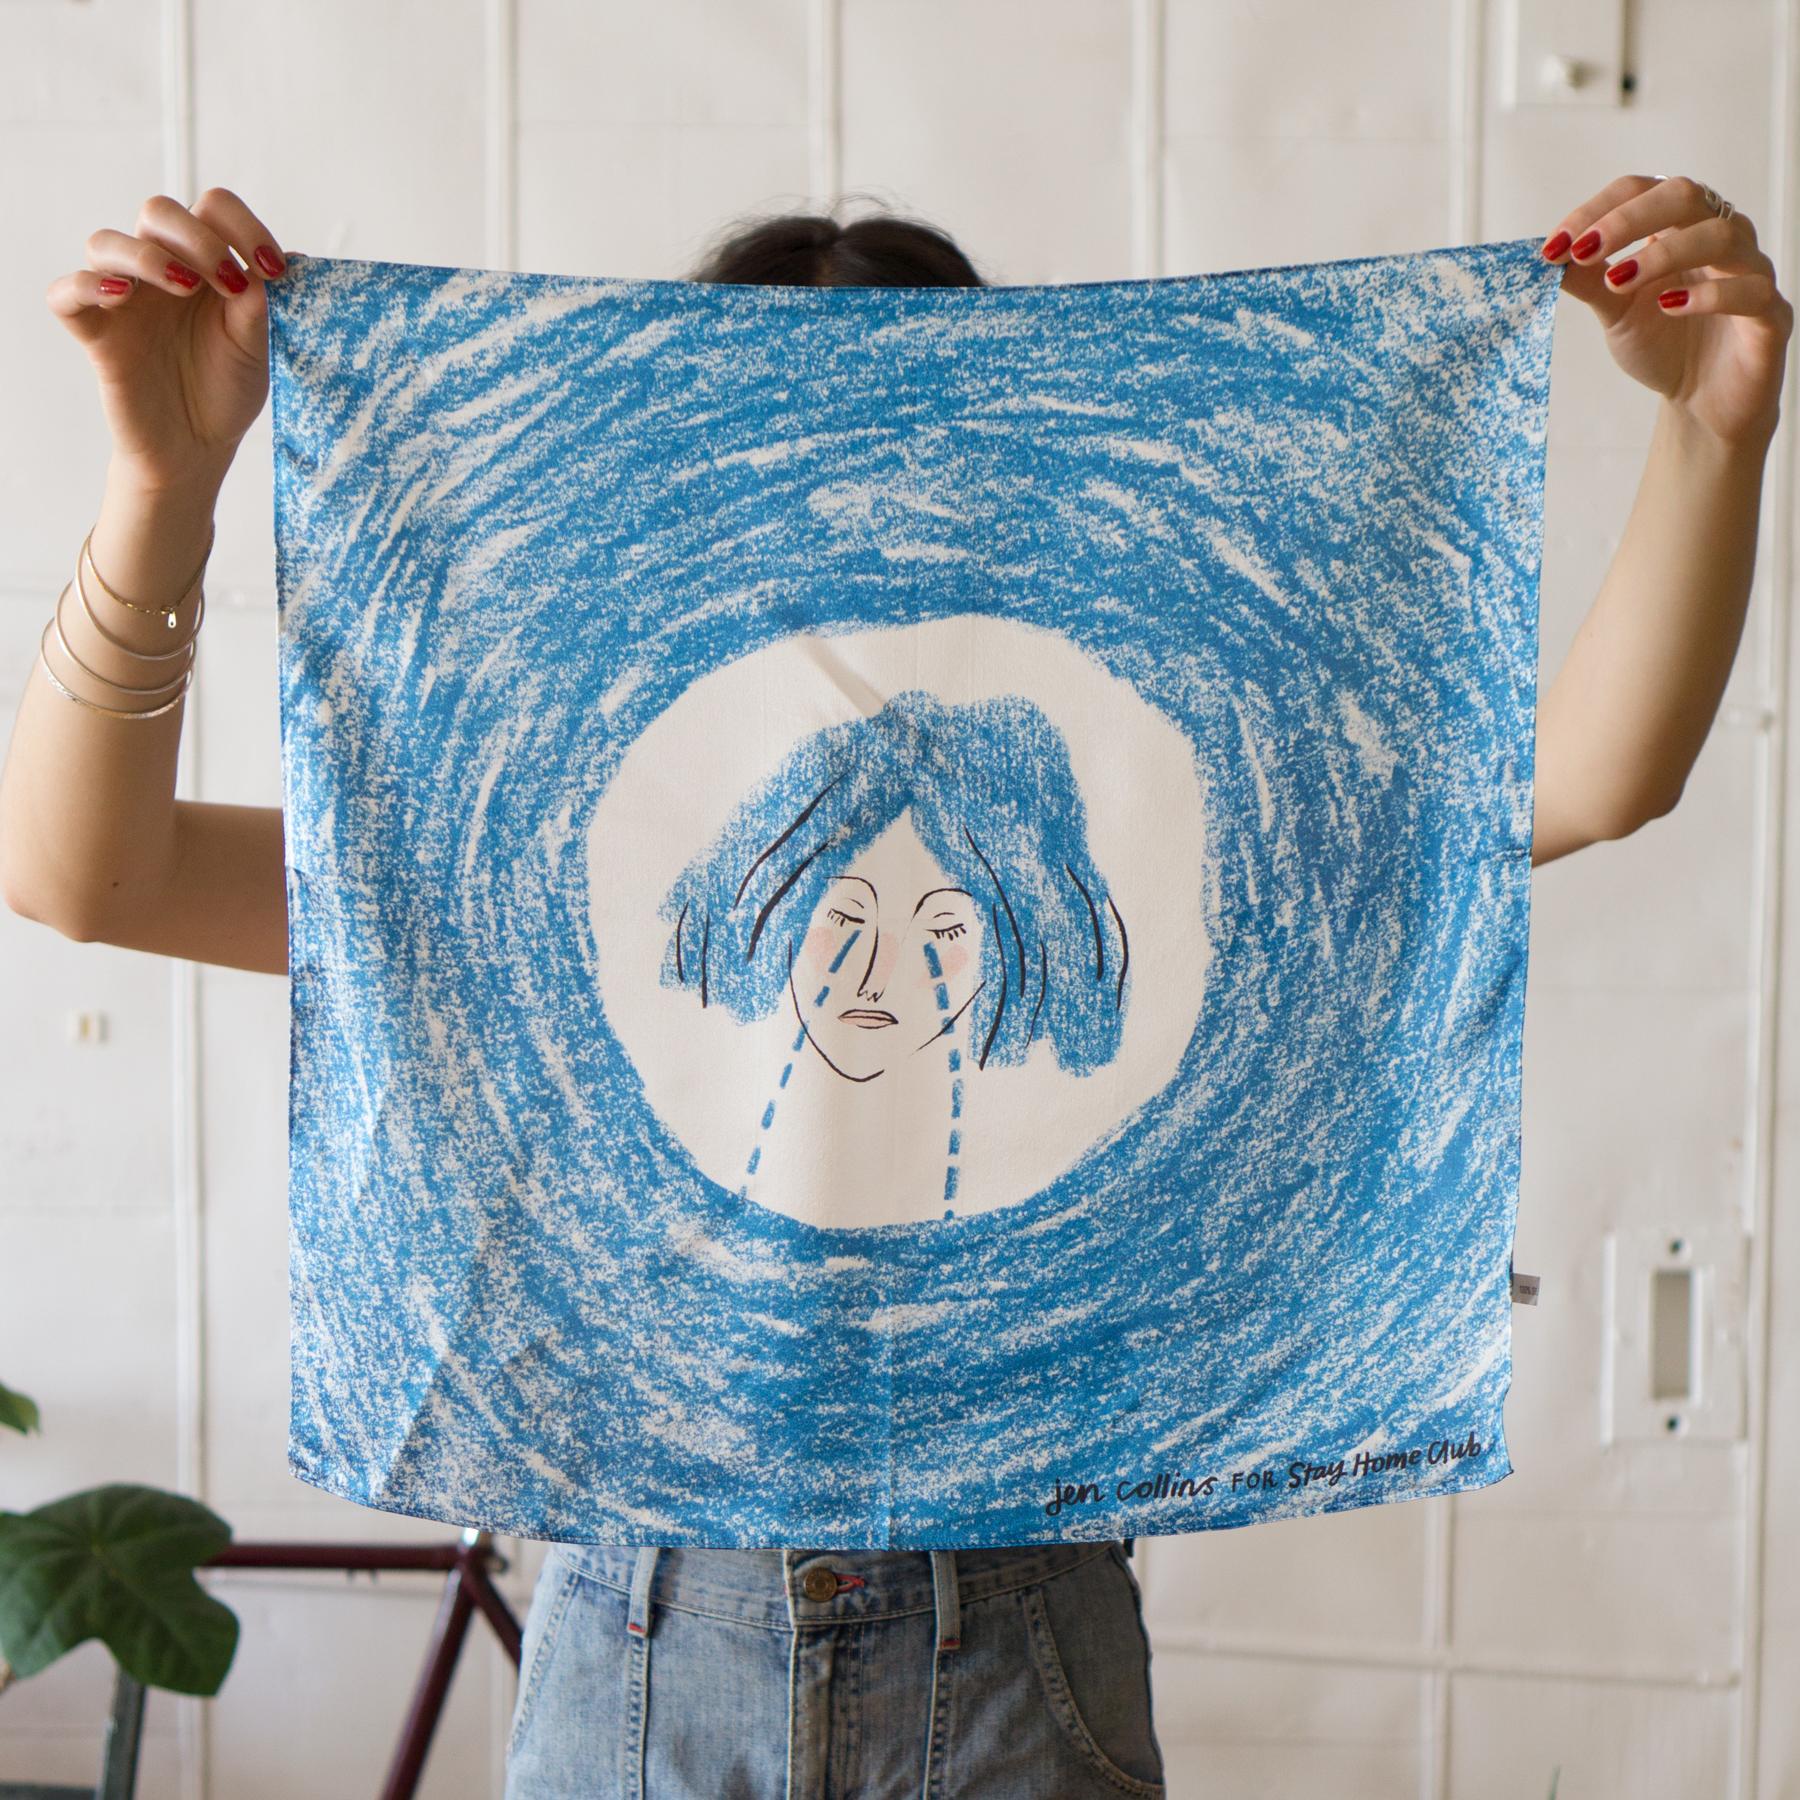 alice-scarf-image-1.jpg